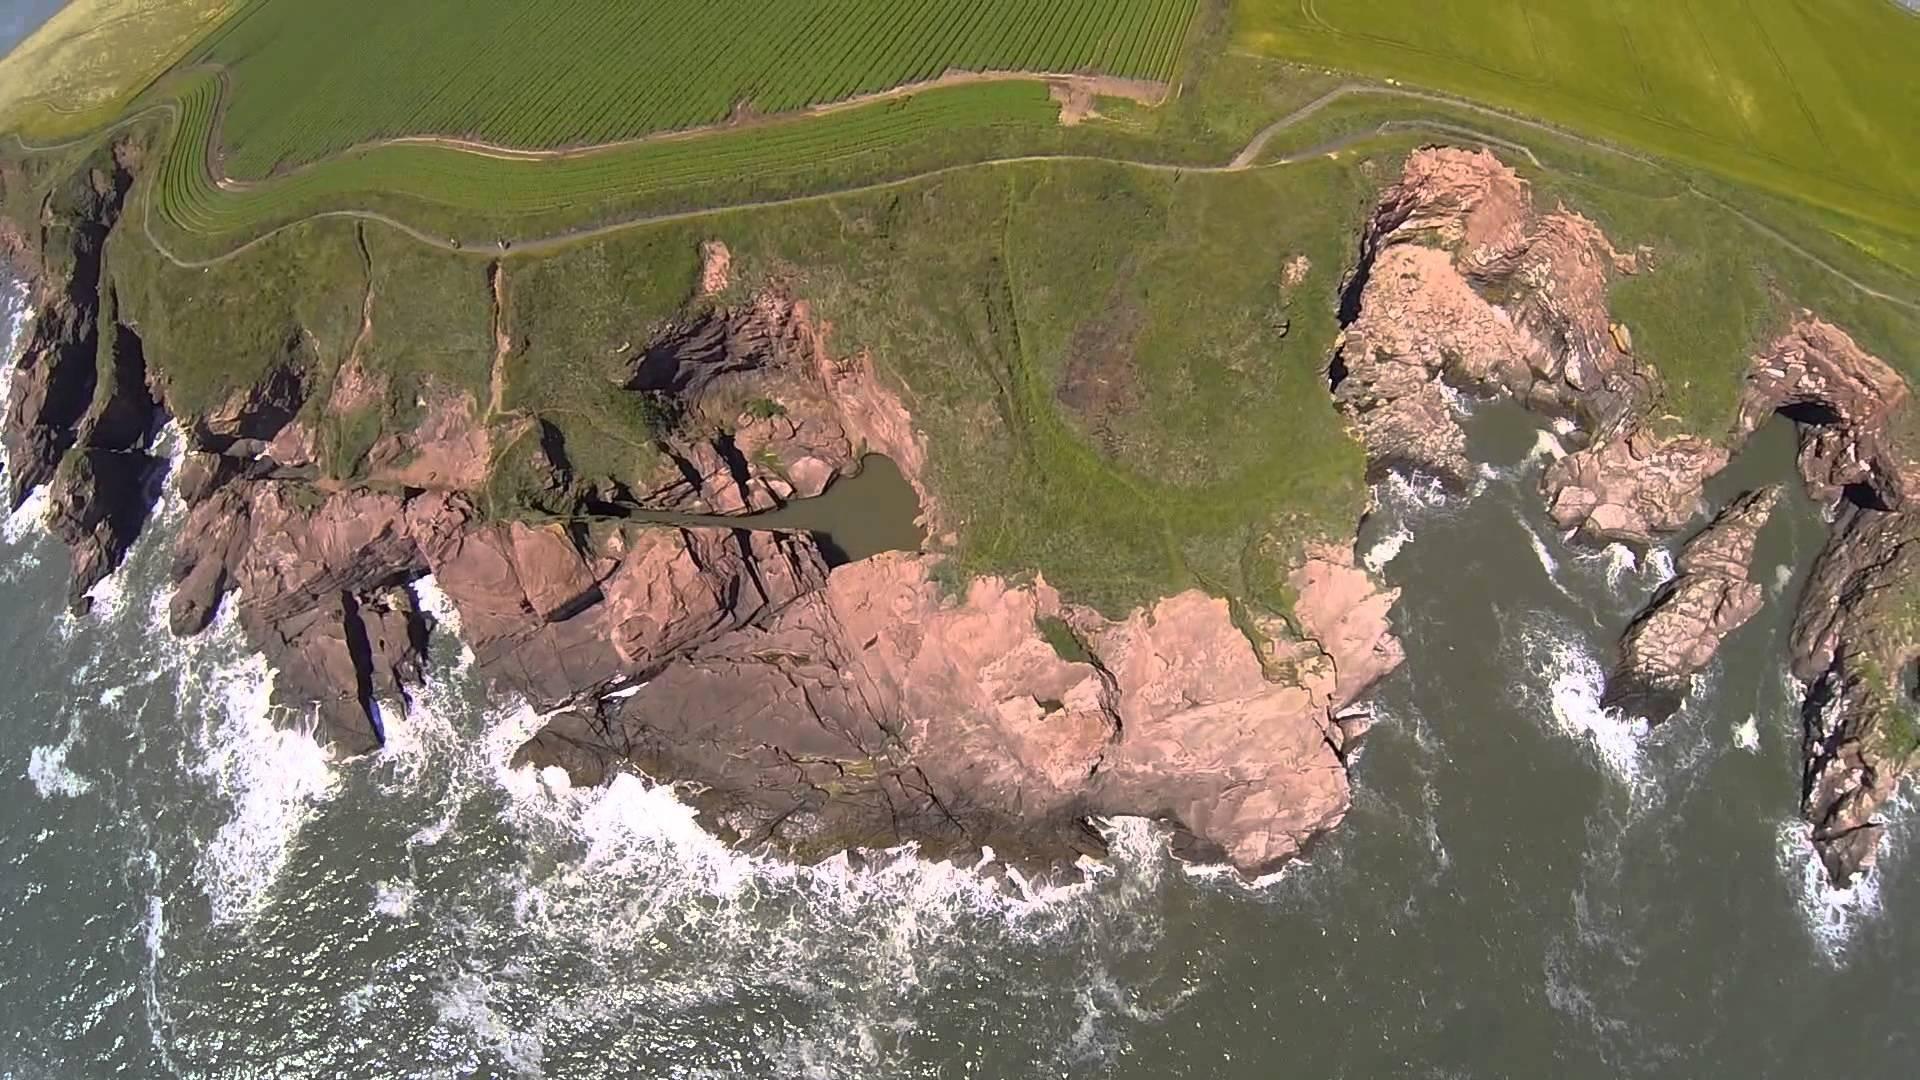 Seaton Cliffs at Arbroath